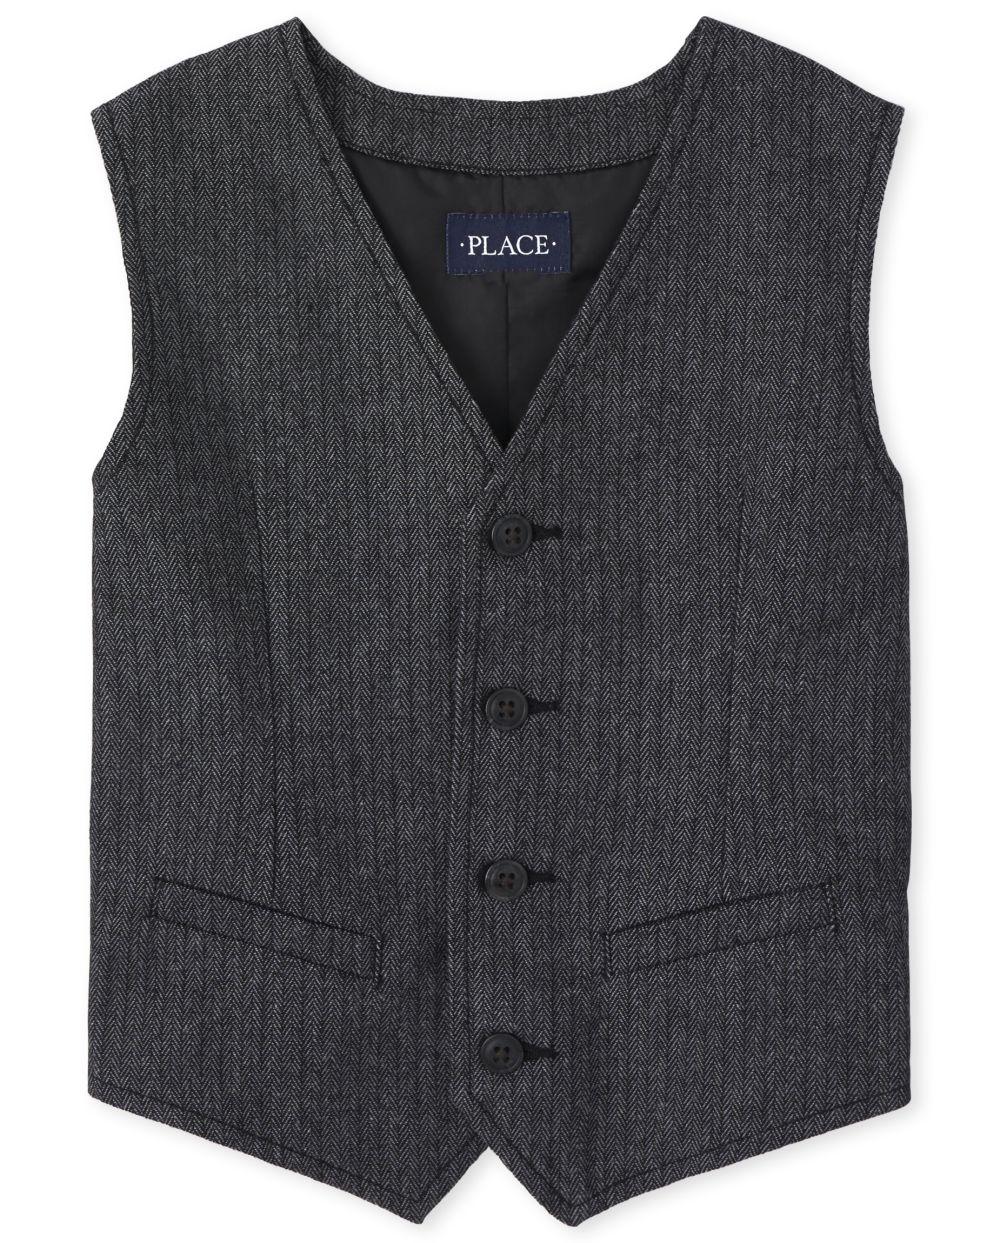 Boys Herringbone Dressy Vest